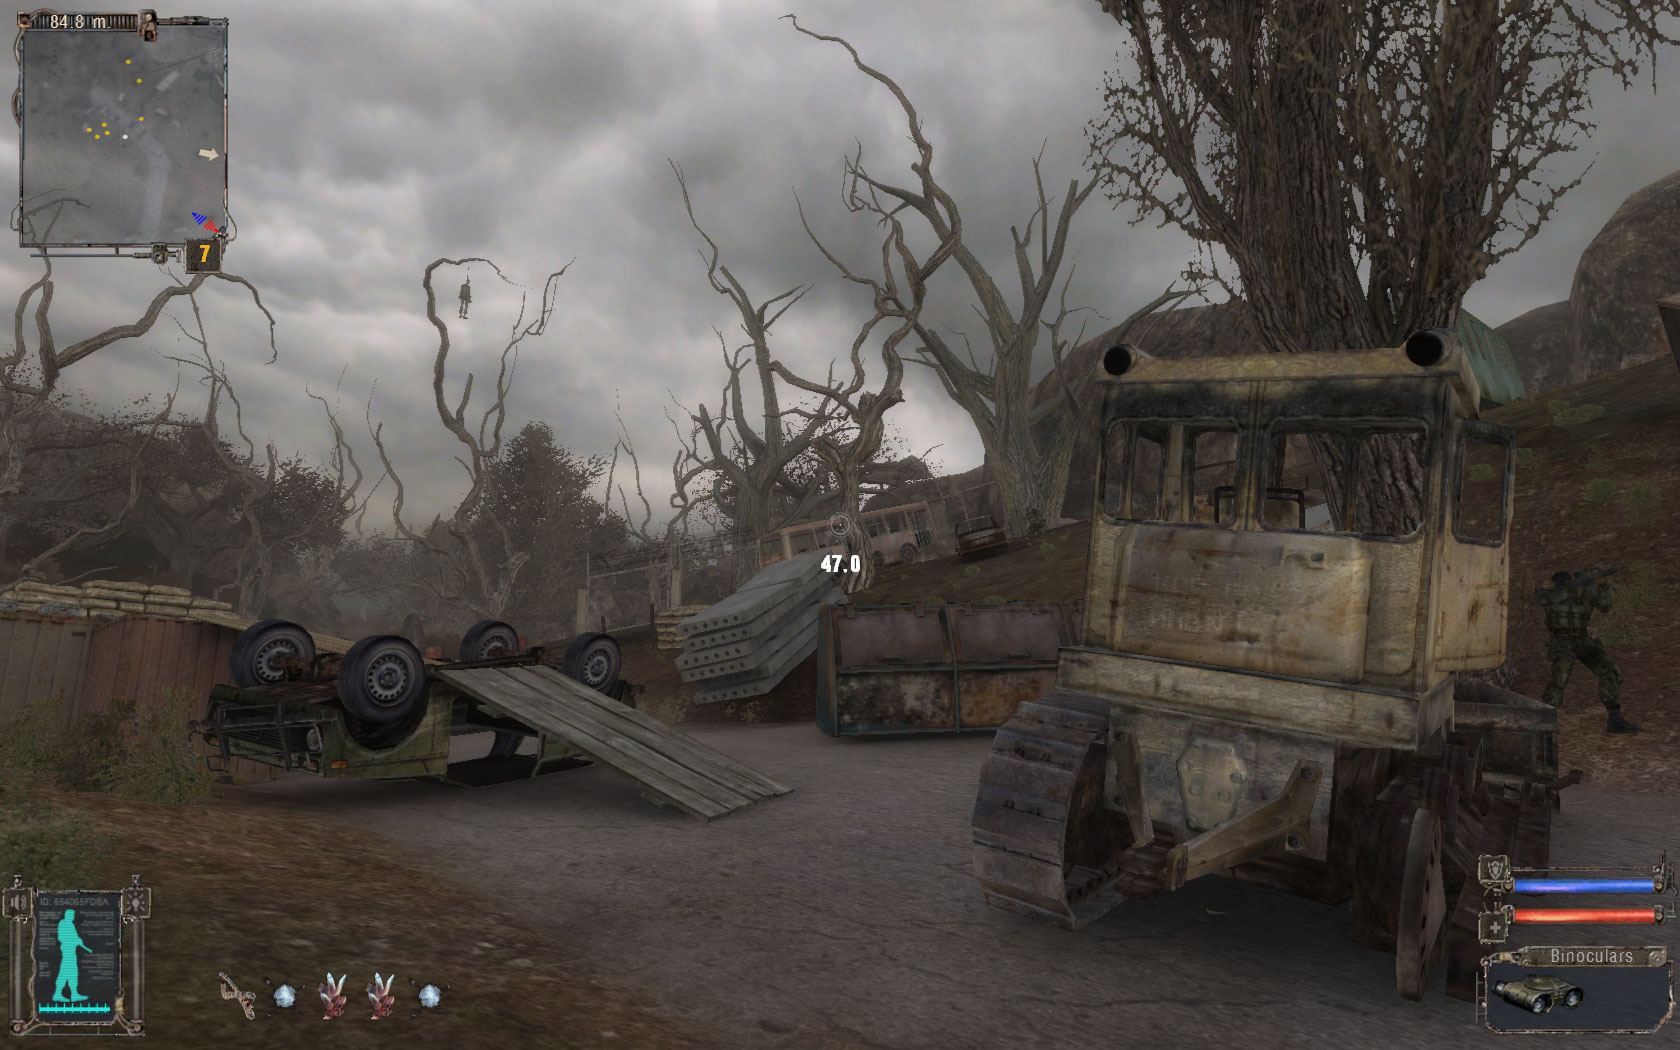 S.T.A.L.K.E.R.: Call of Pripyat Reviews - GameSpot